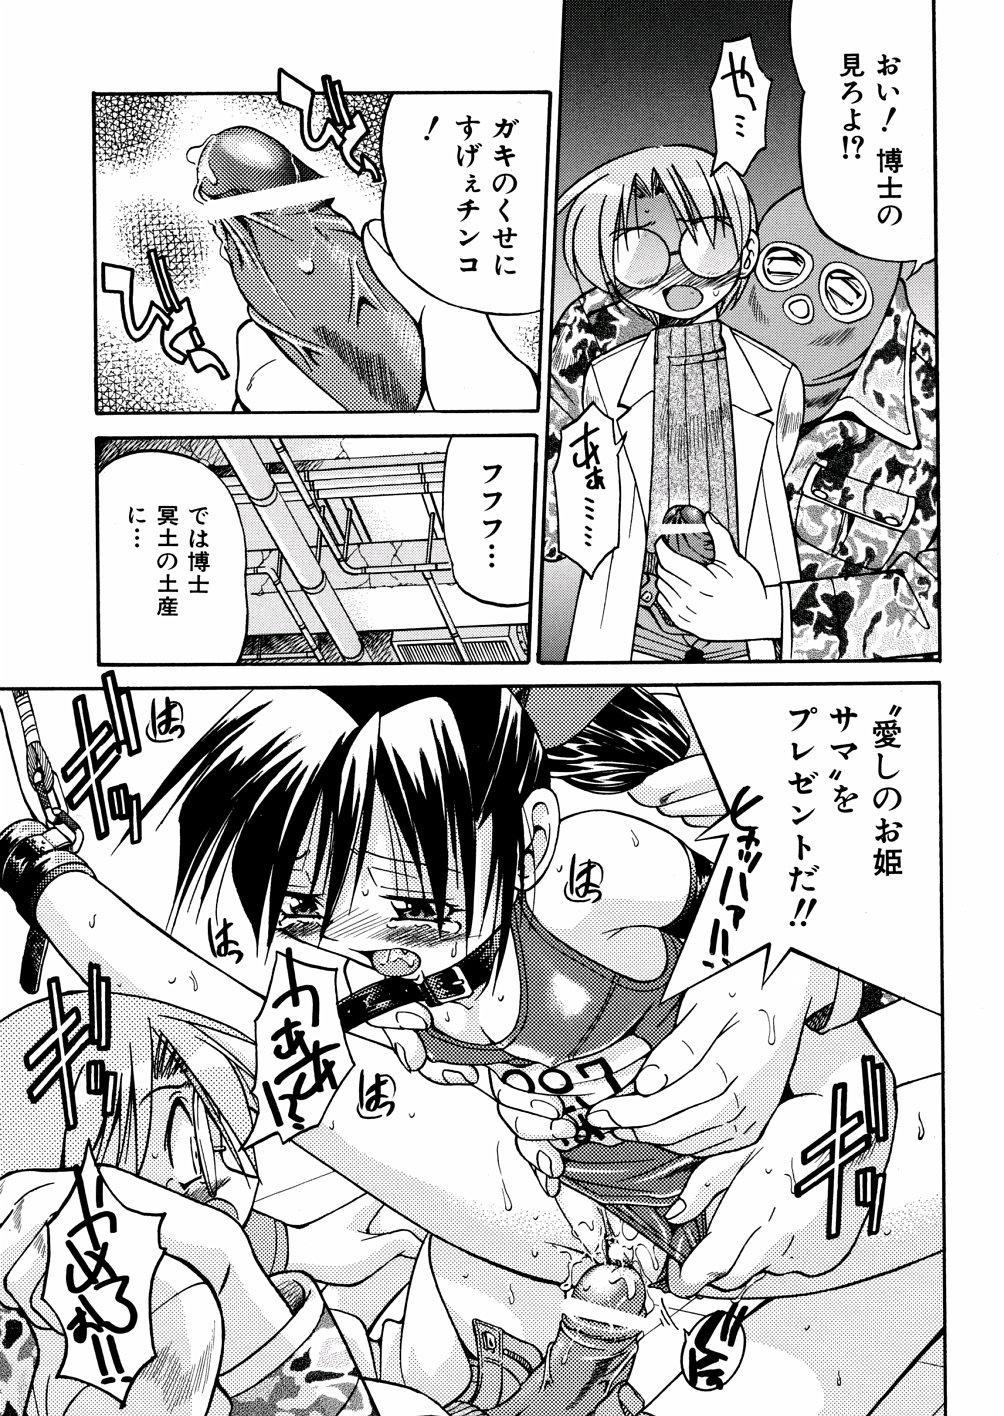 00 Nanako - Agent Nanako 25